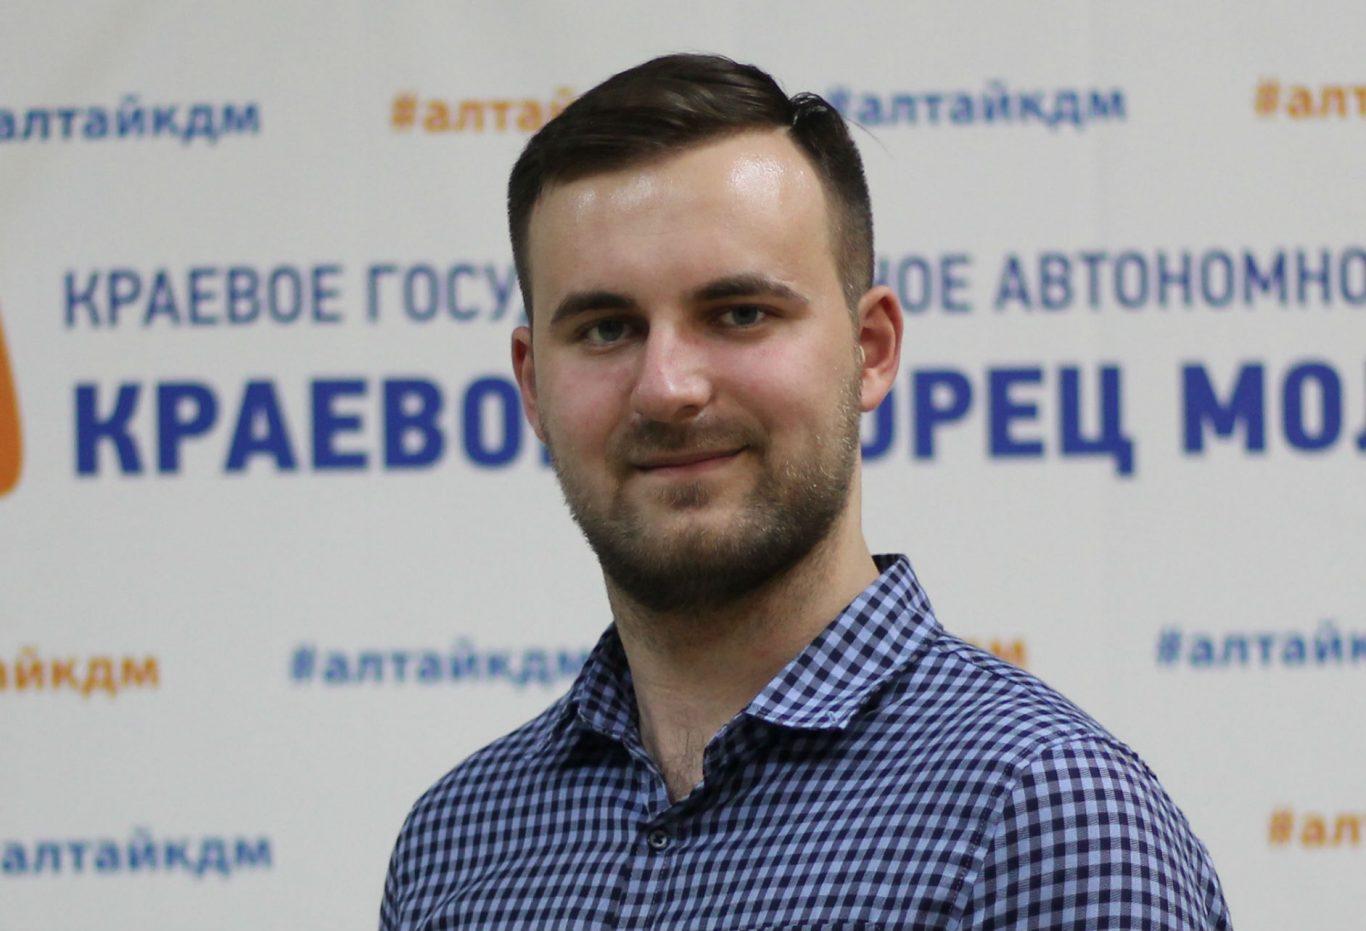 Федюнин Никита Сергеевич